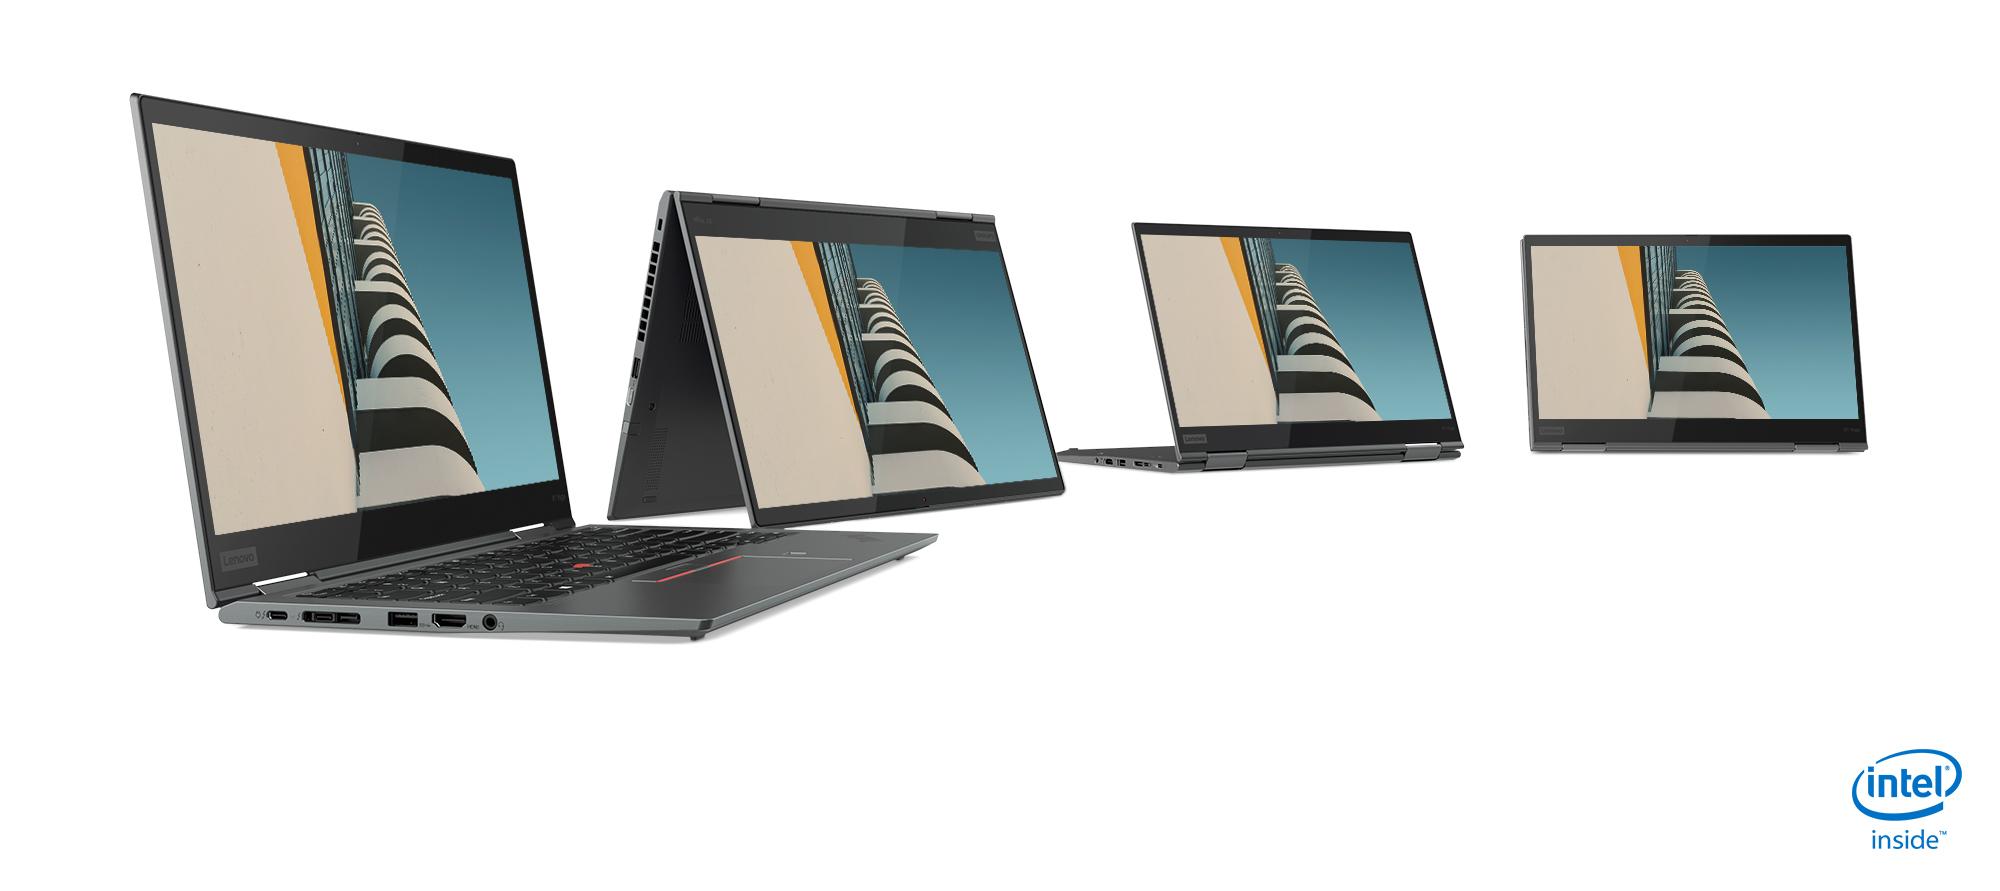 CES 2019: Lenovo introduces ThinkPad X1 upgrades, new